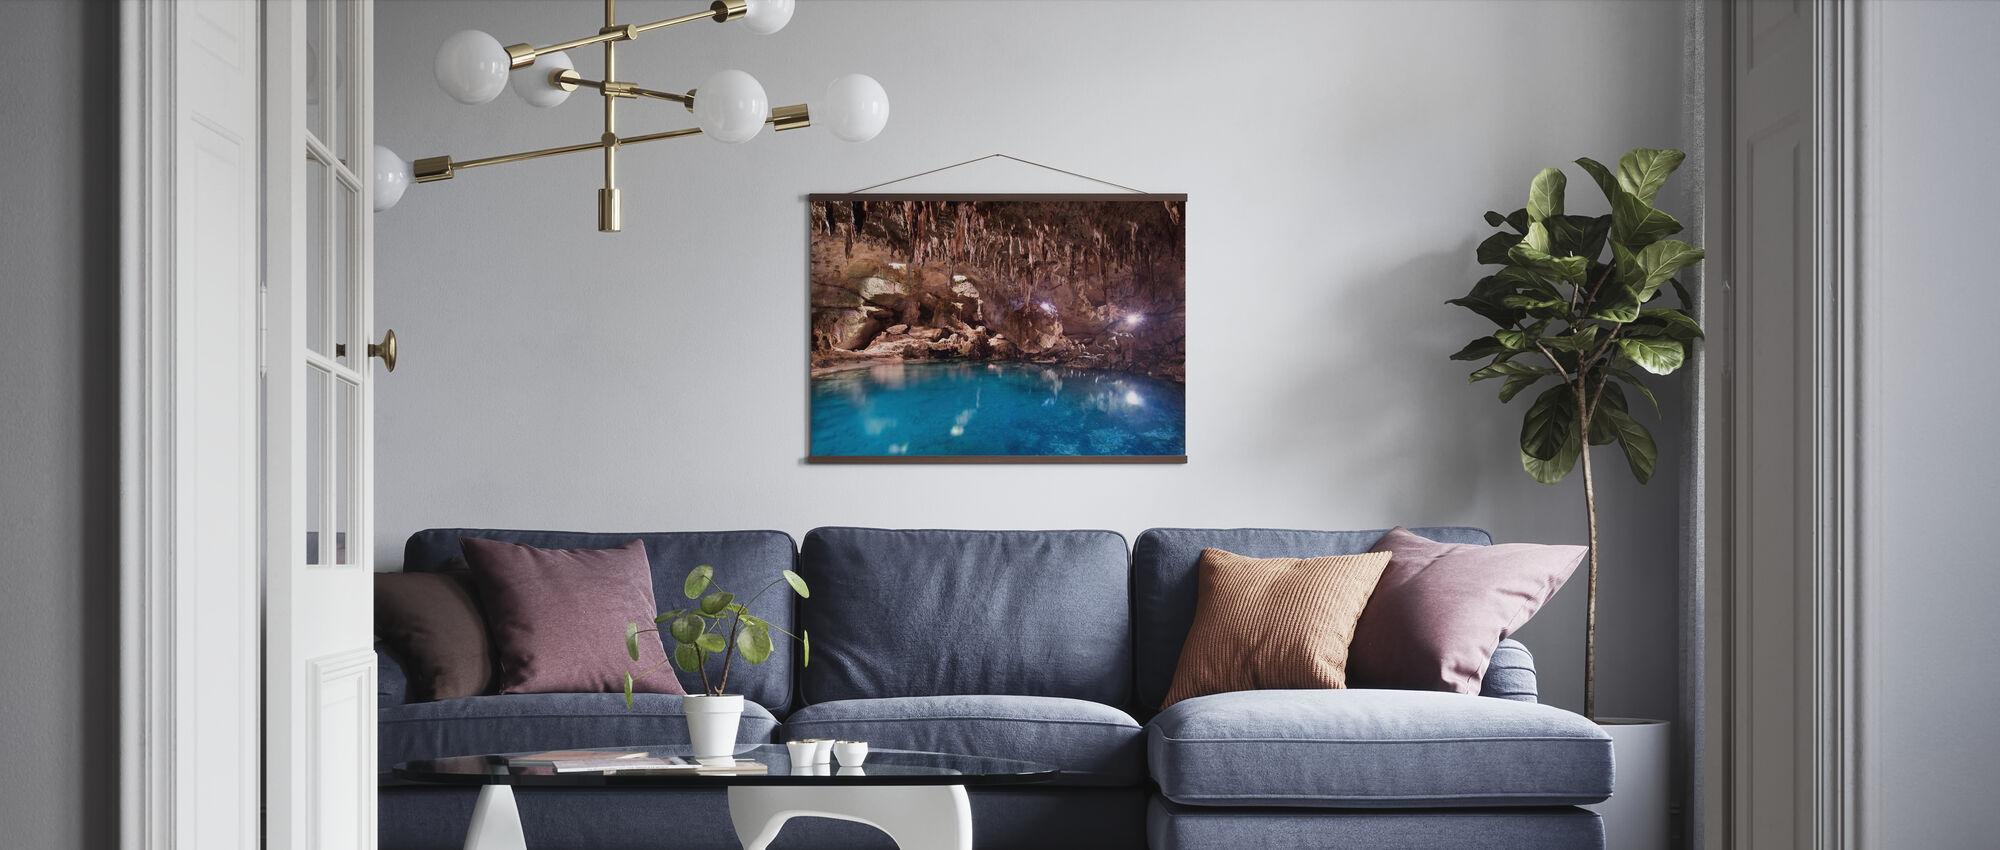 Hinagdanan Cave Pool - Poster - Wohnzimmer